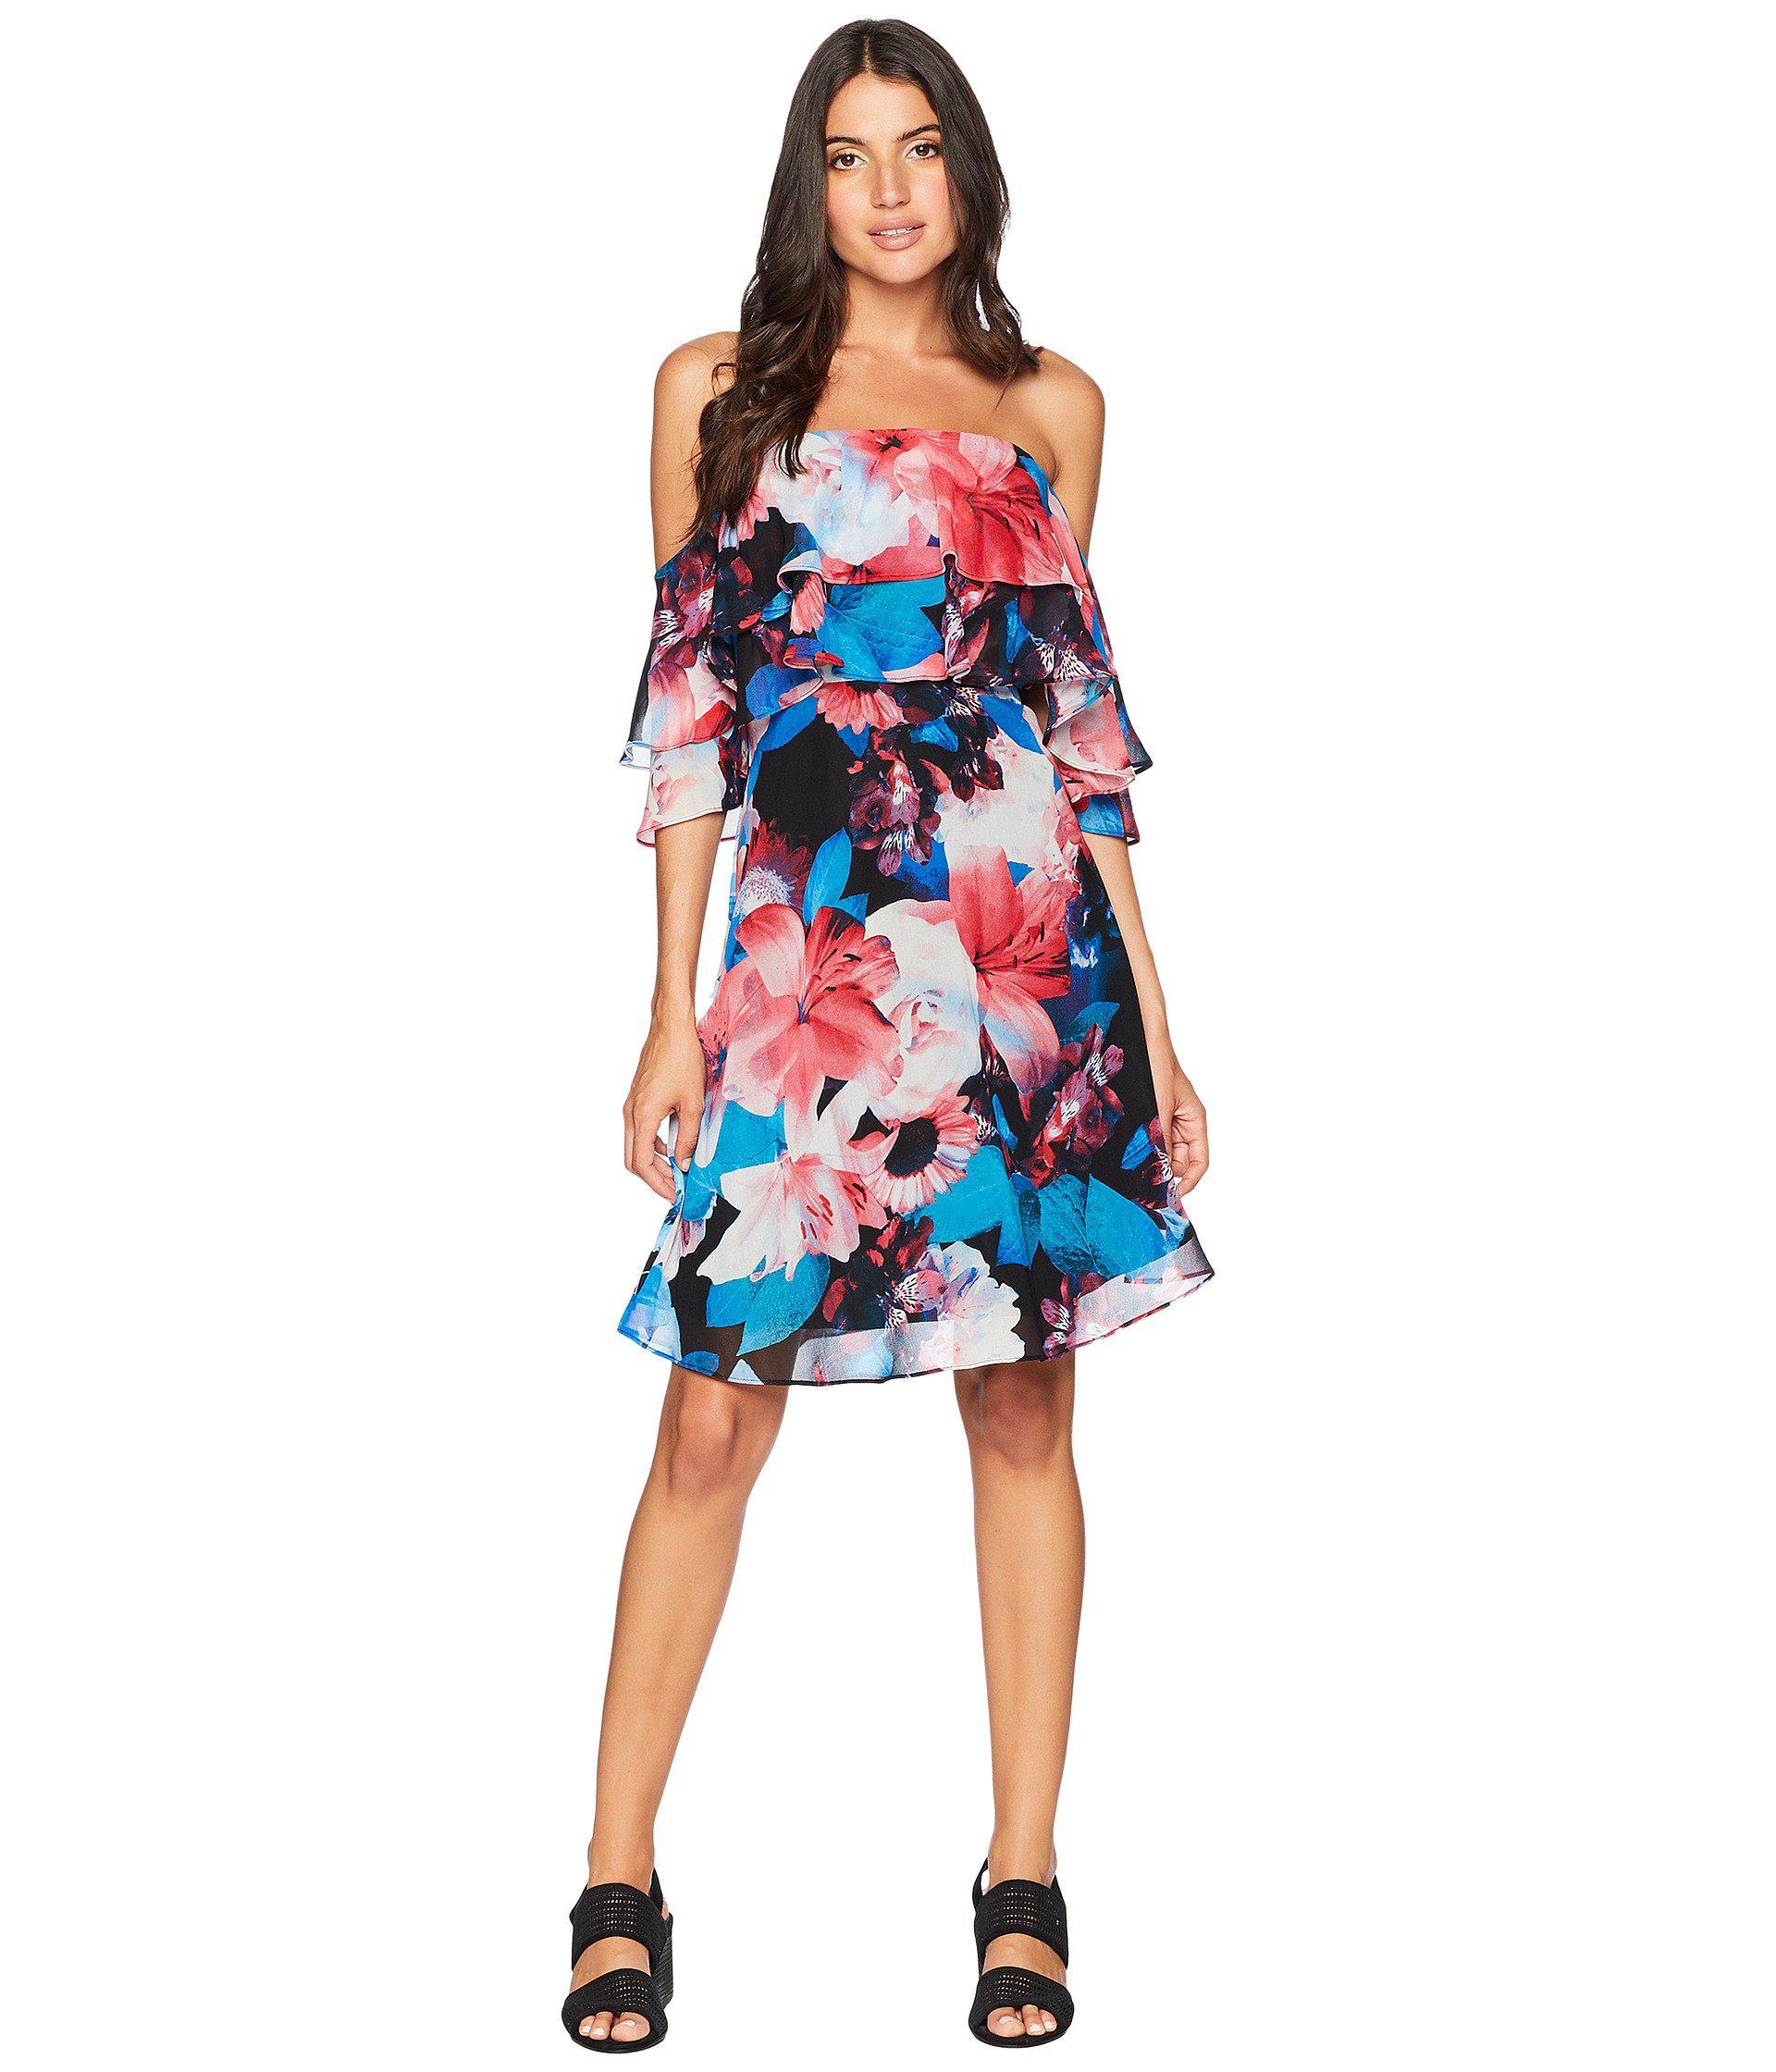 bdb6dcba7f71 Calvin Klein. Women s Tiered Off The Shoulder Flower Print Dress Cd8b32ng